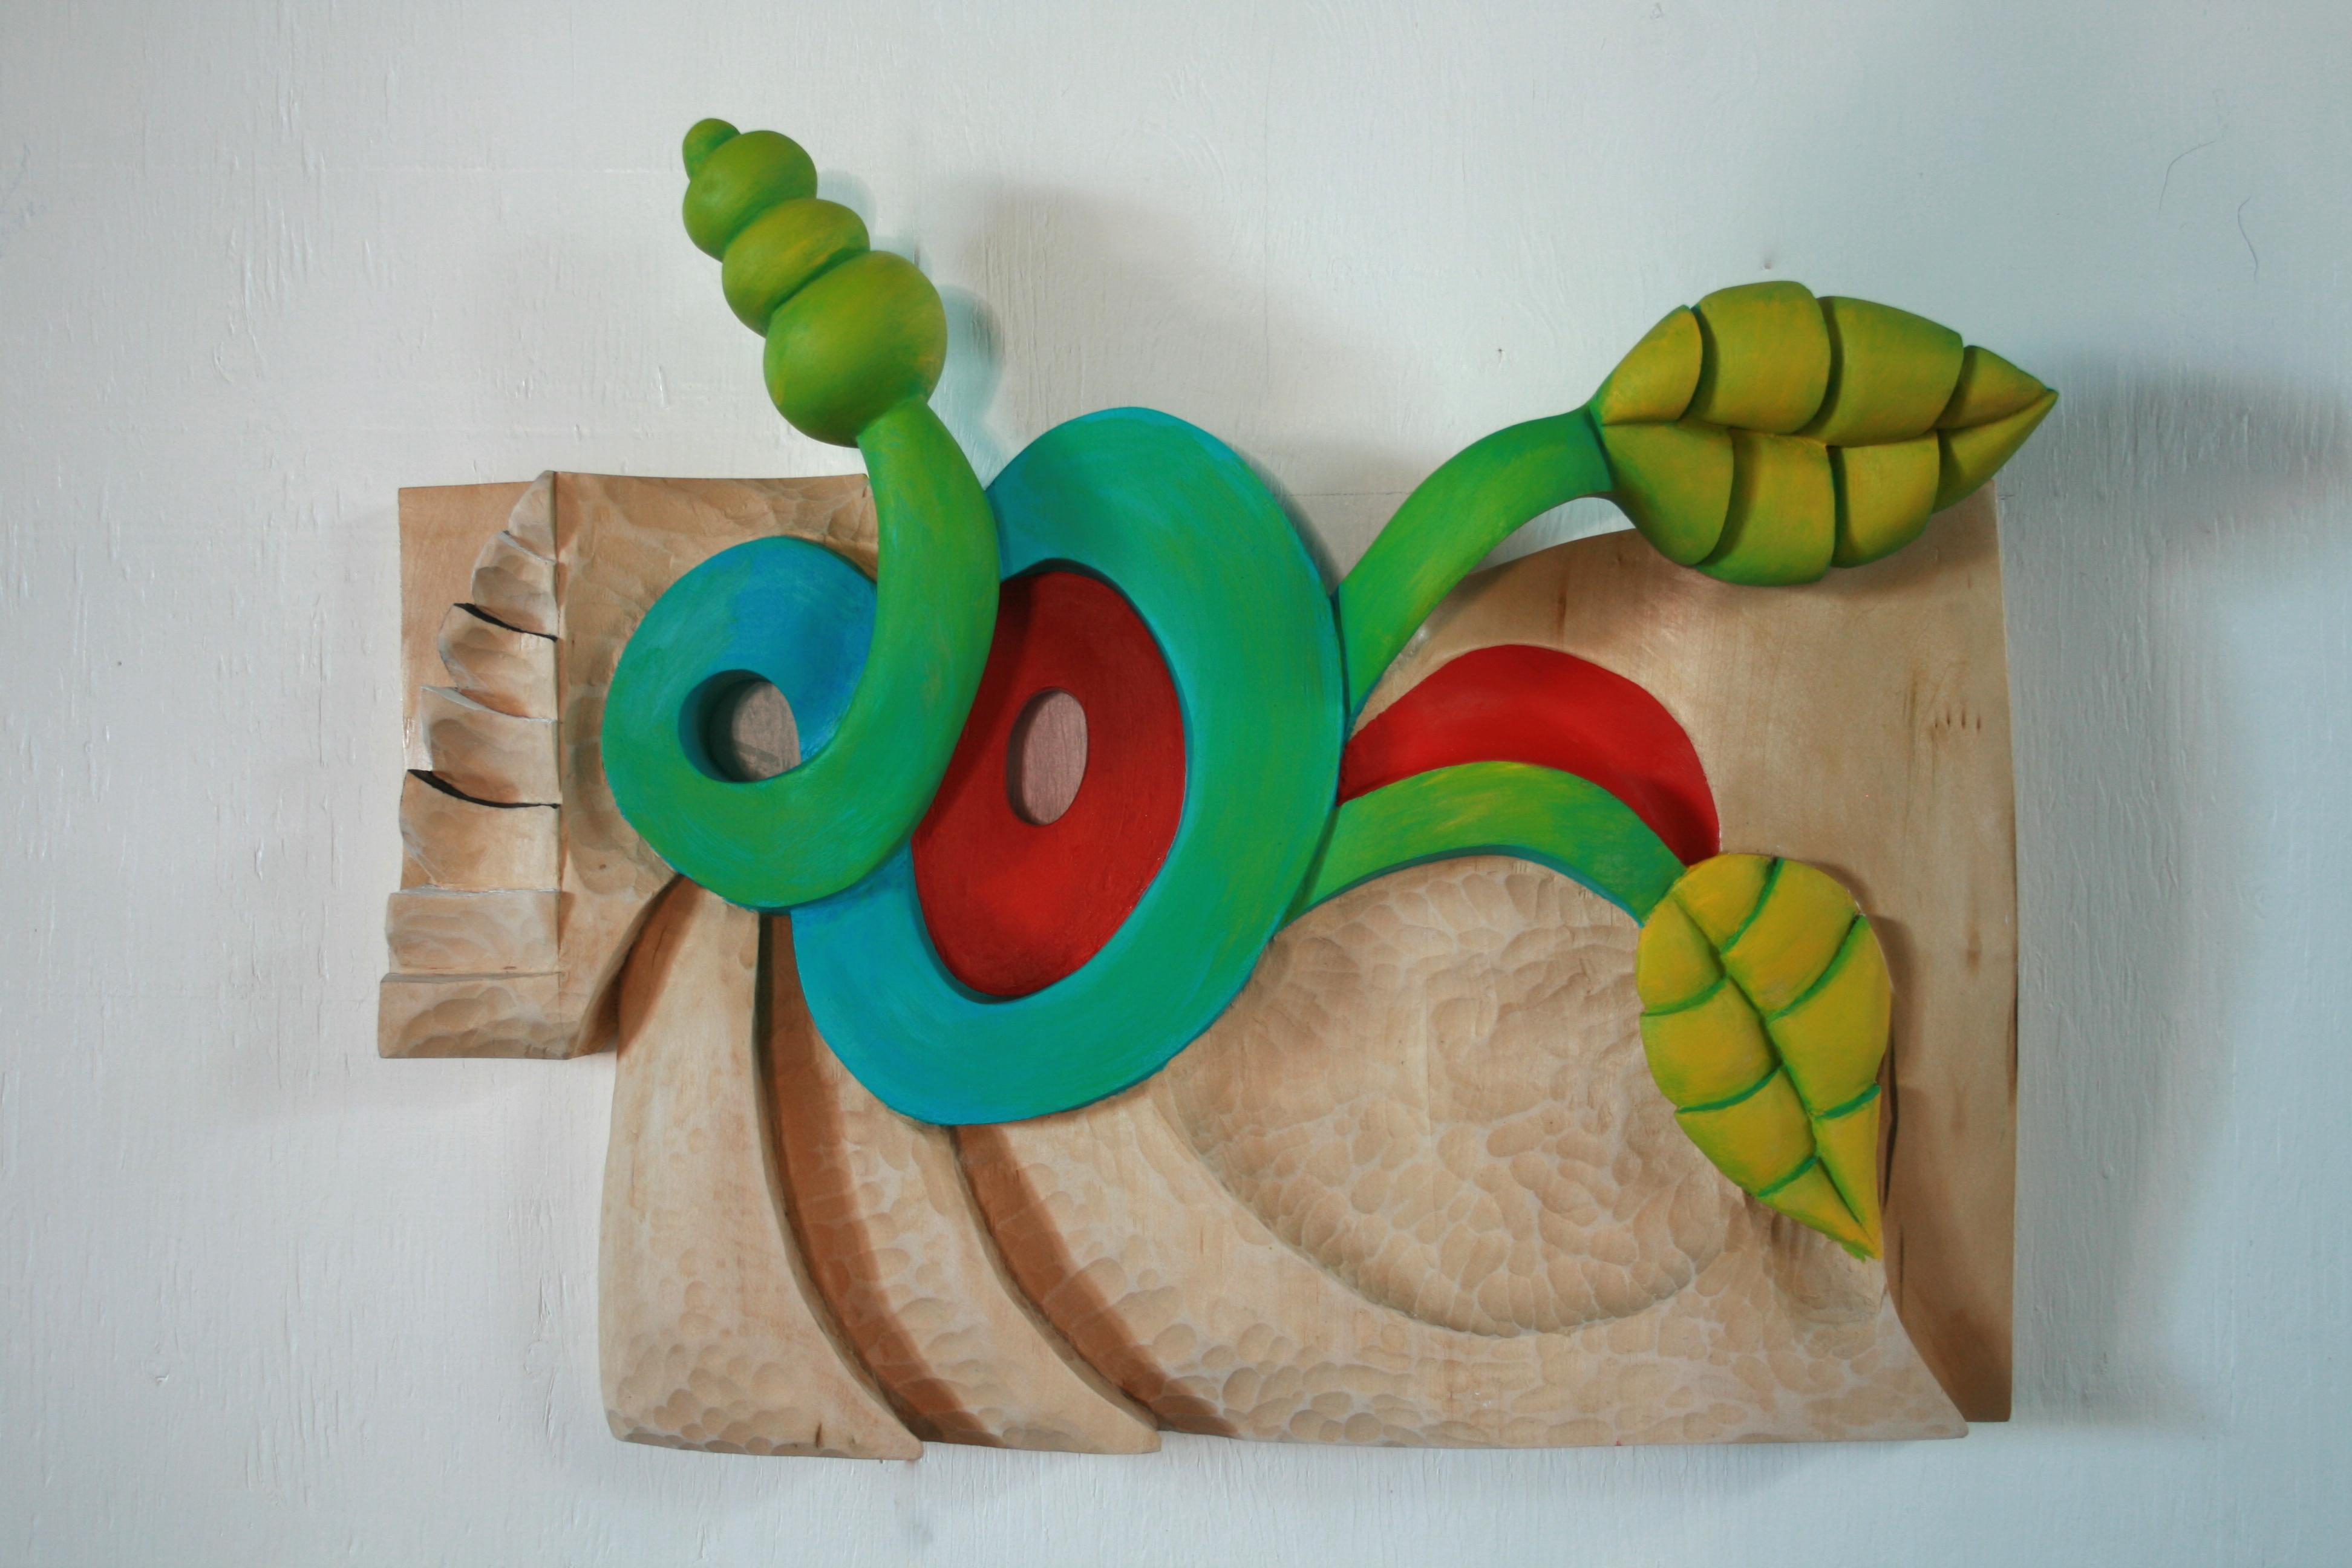 Bouyant 15x20x5 wood,paint